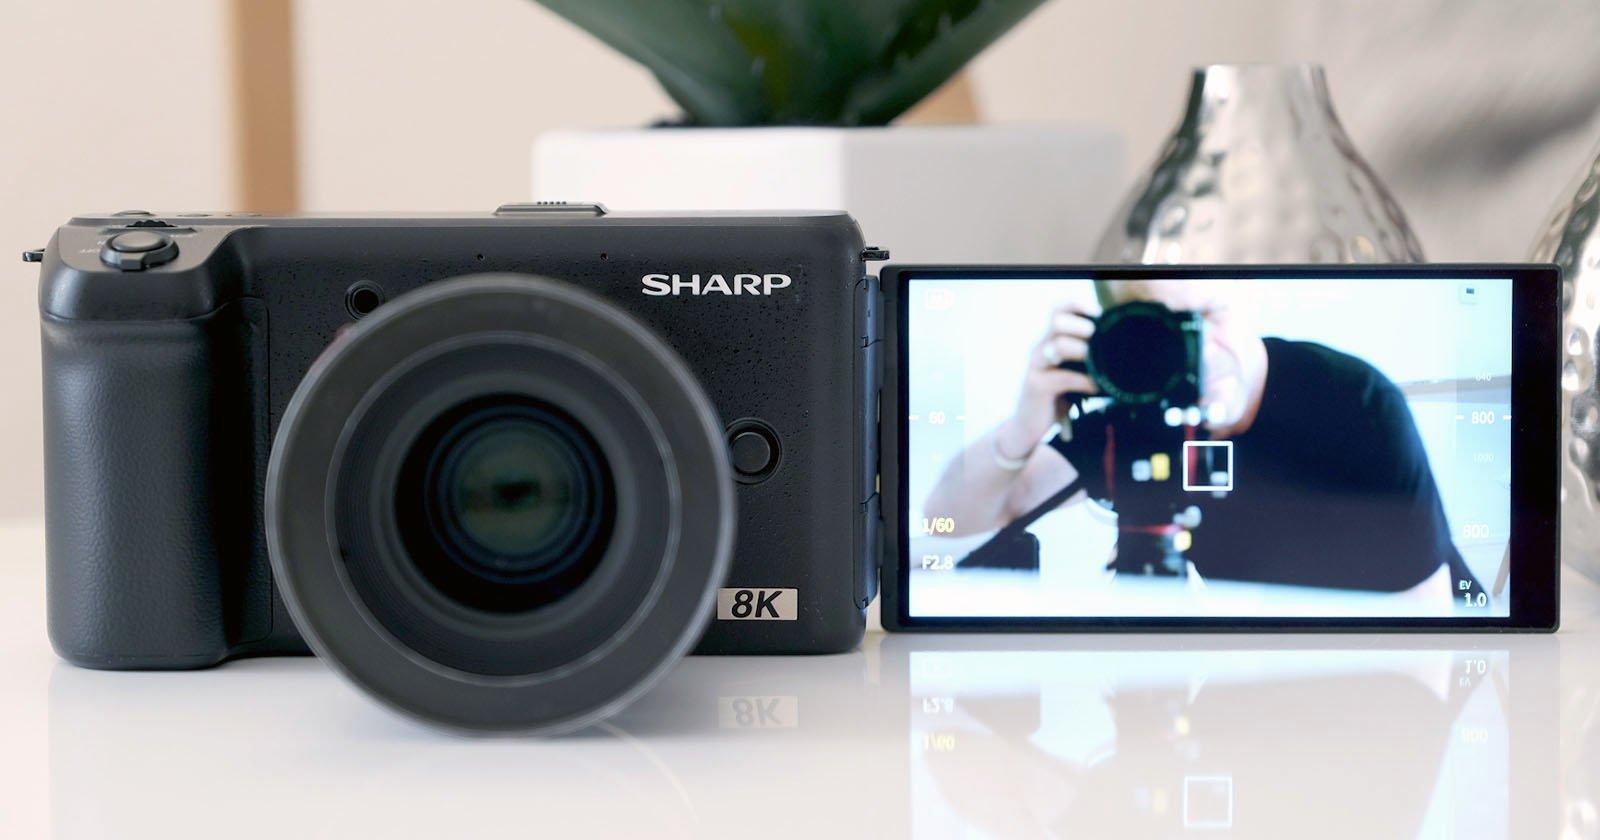 Hands-On with Sharp's Sub-$5,000 8K Mirrorless Camera